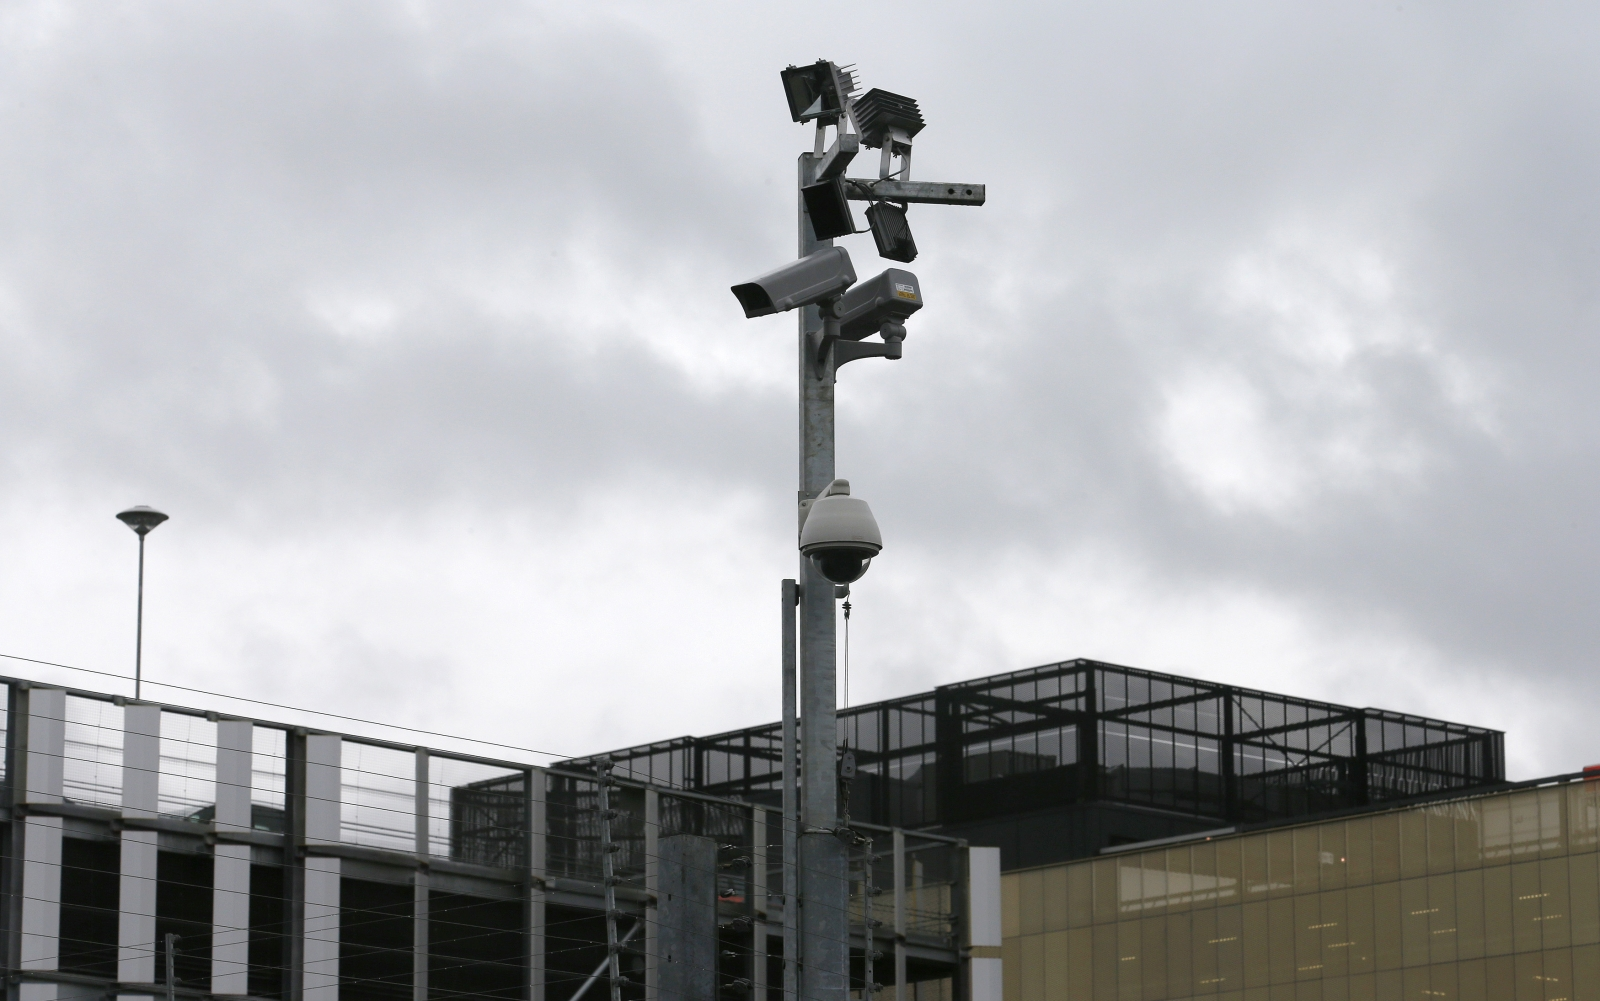 CCTV camera to be cut